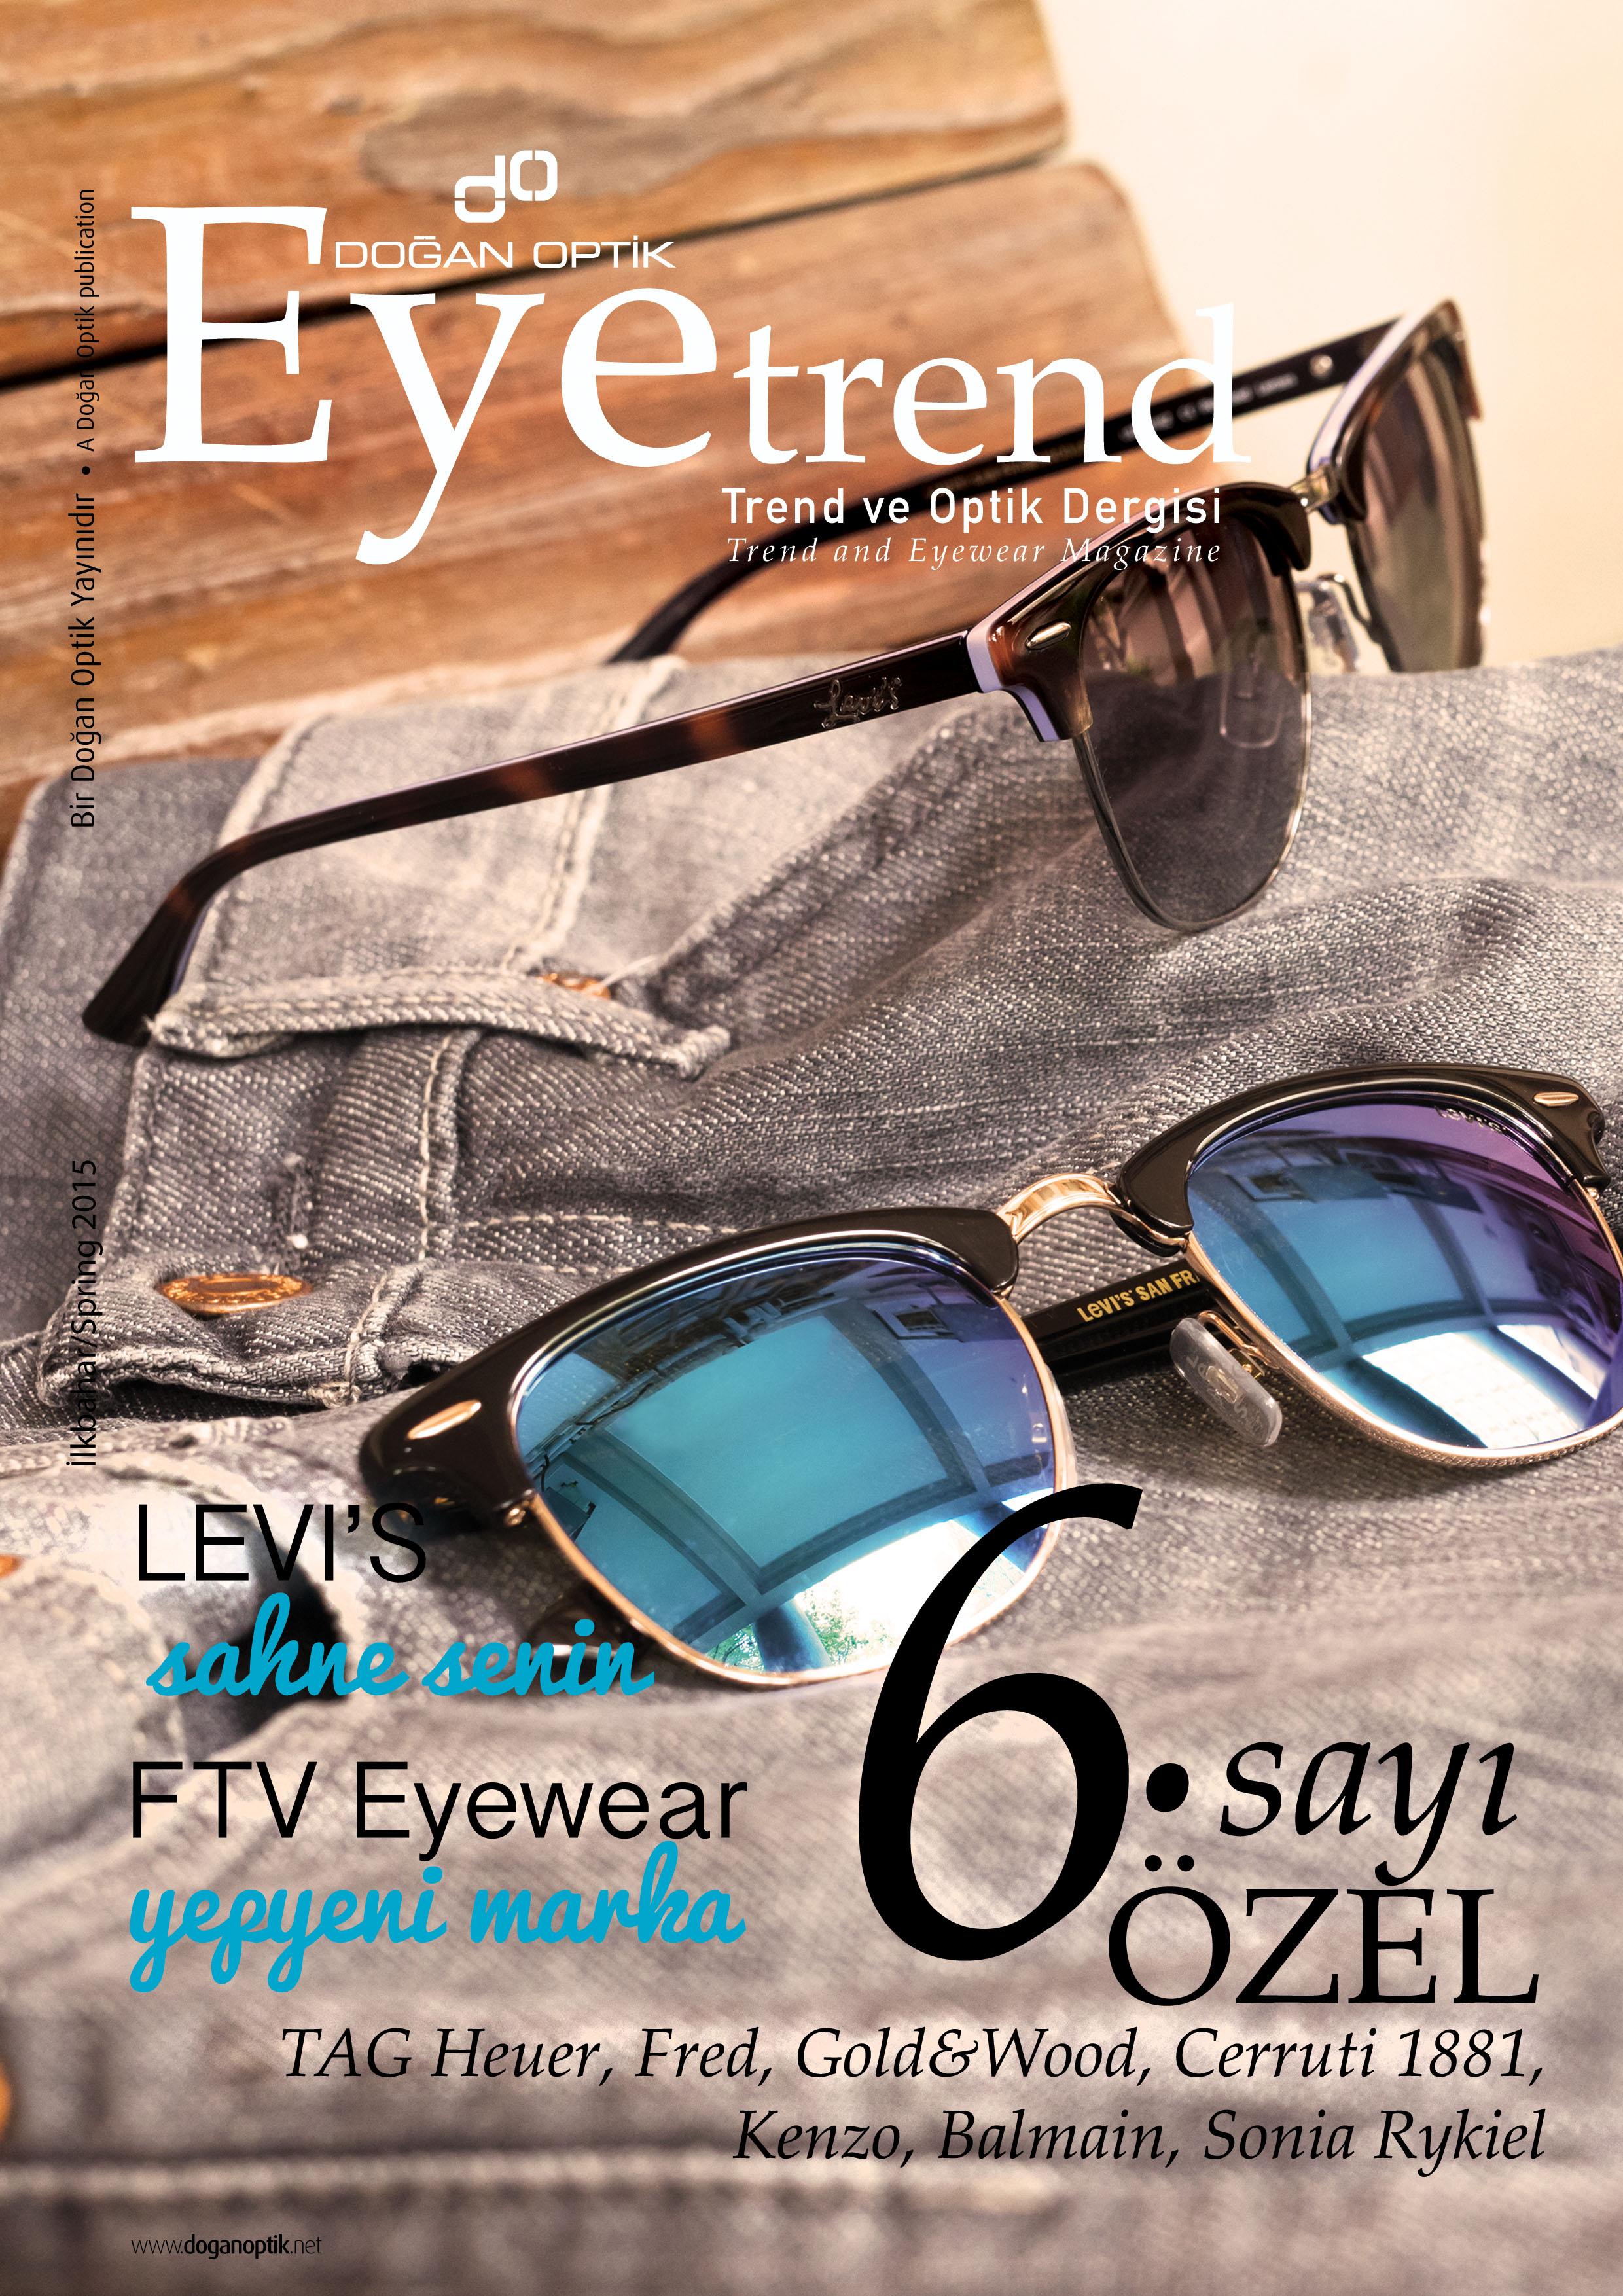 Eyetrend